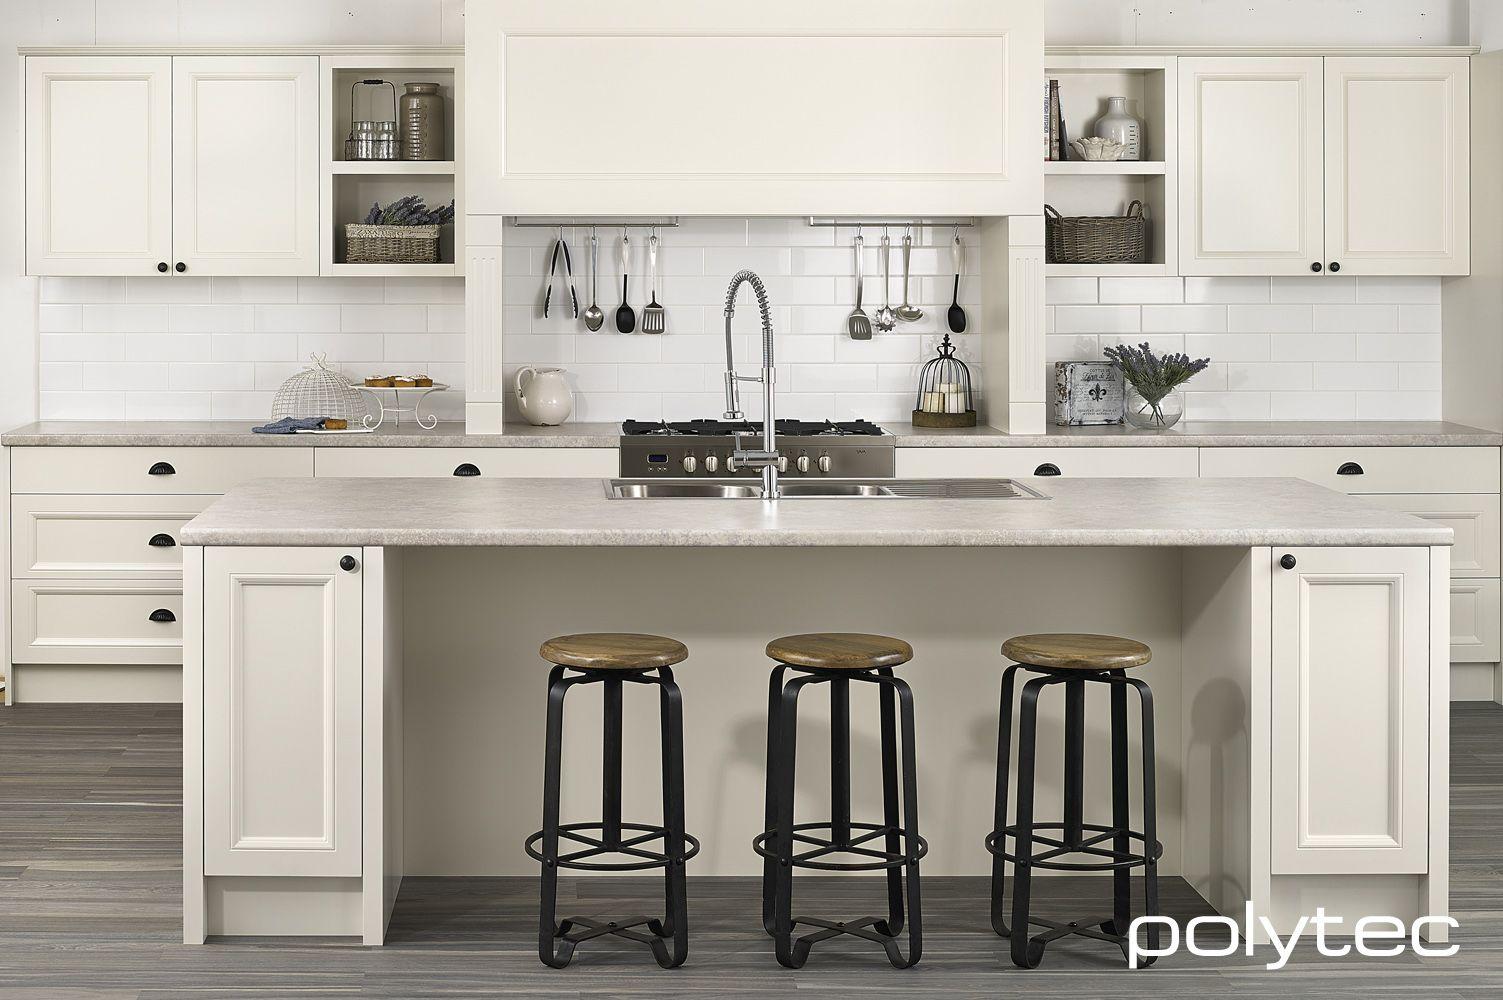 polytec THERMOLAMINATED doors in 21mm Keimbah Porcelain Matt and